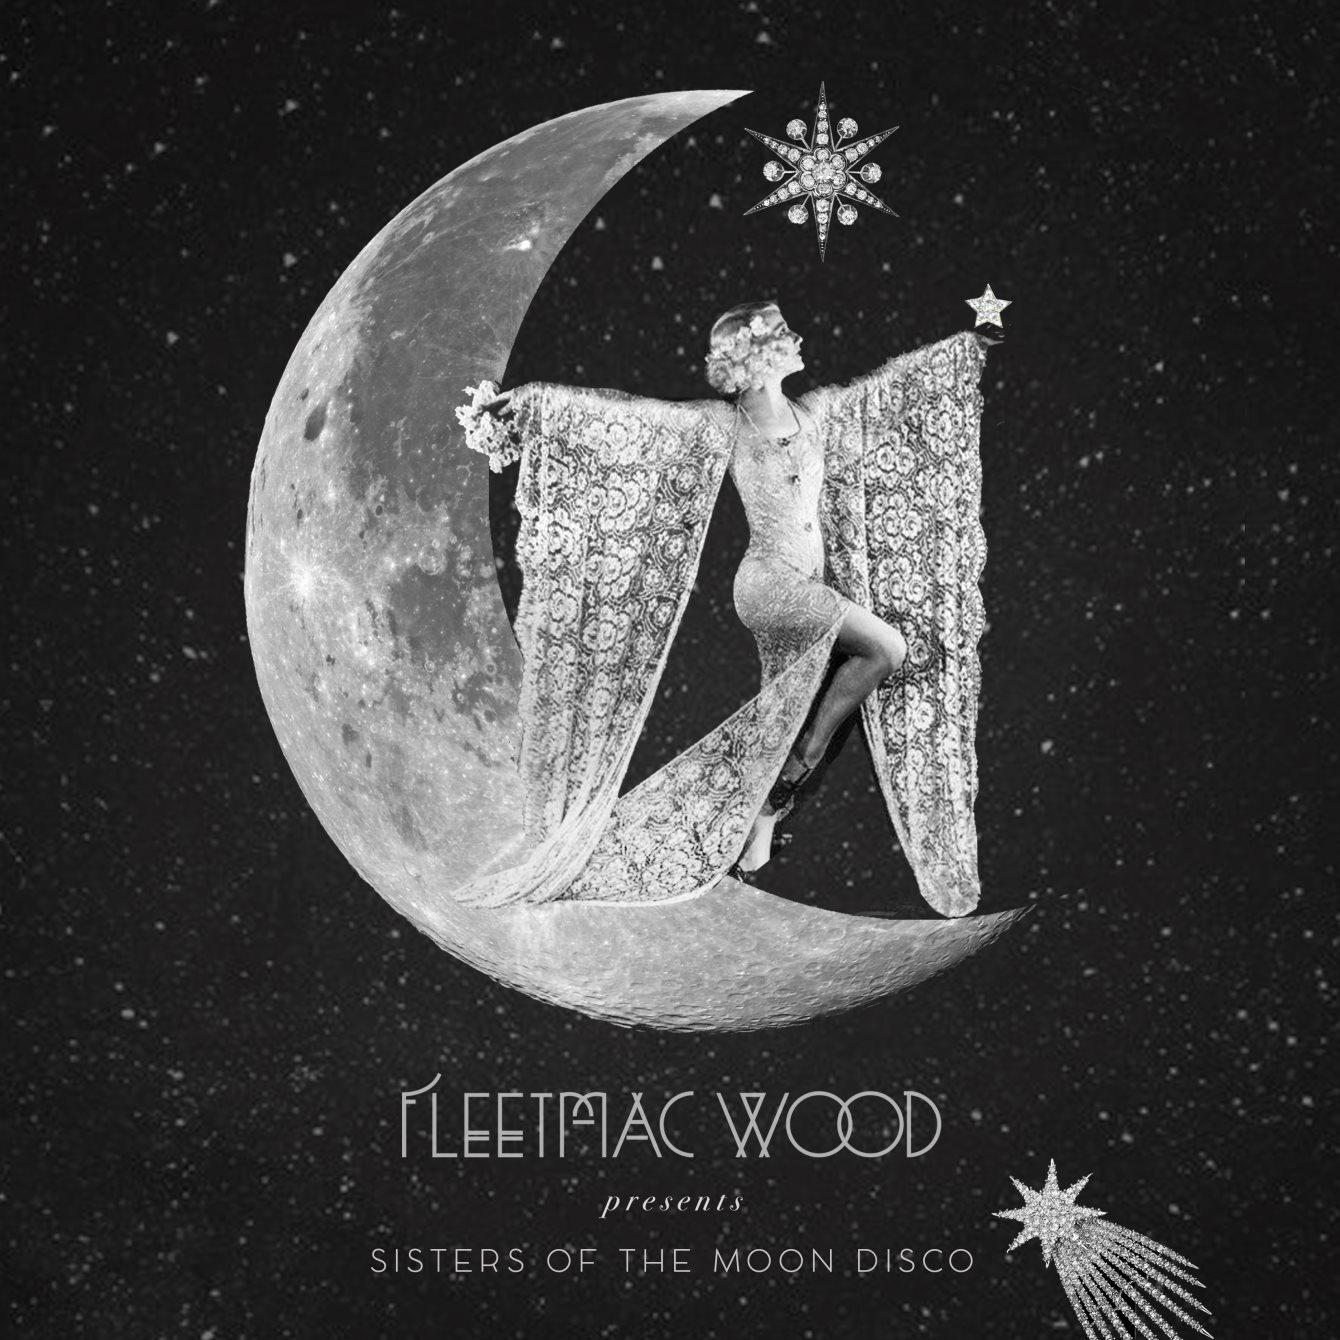 Ra Tickets Fleetmac Wood Presents Sisters Of The Moon Disco